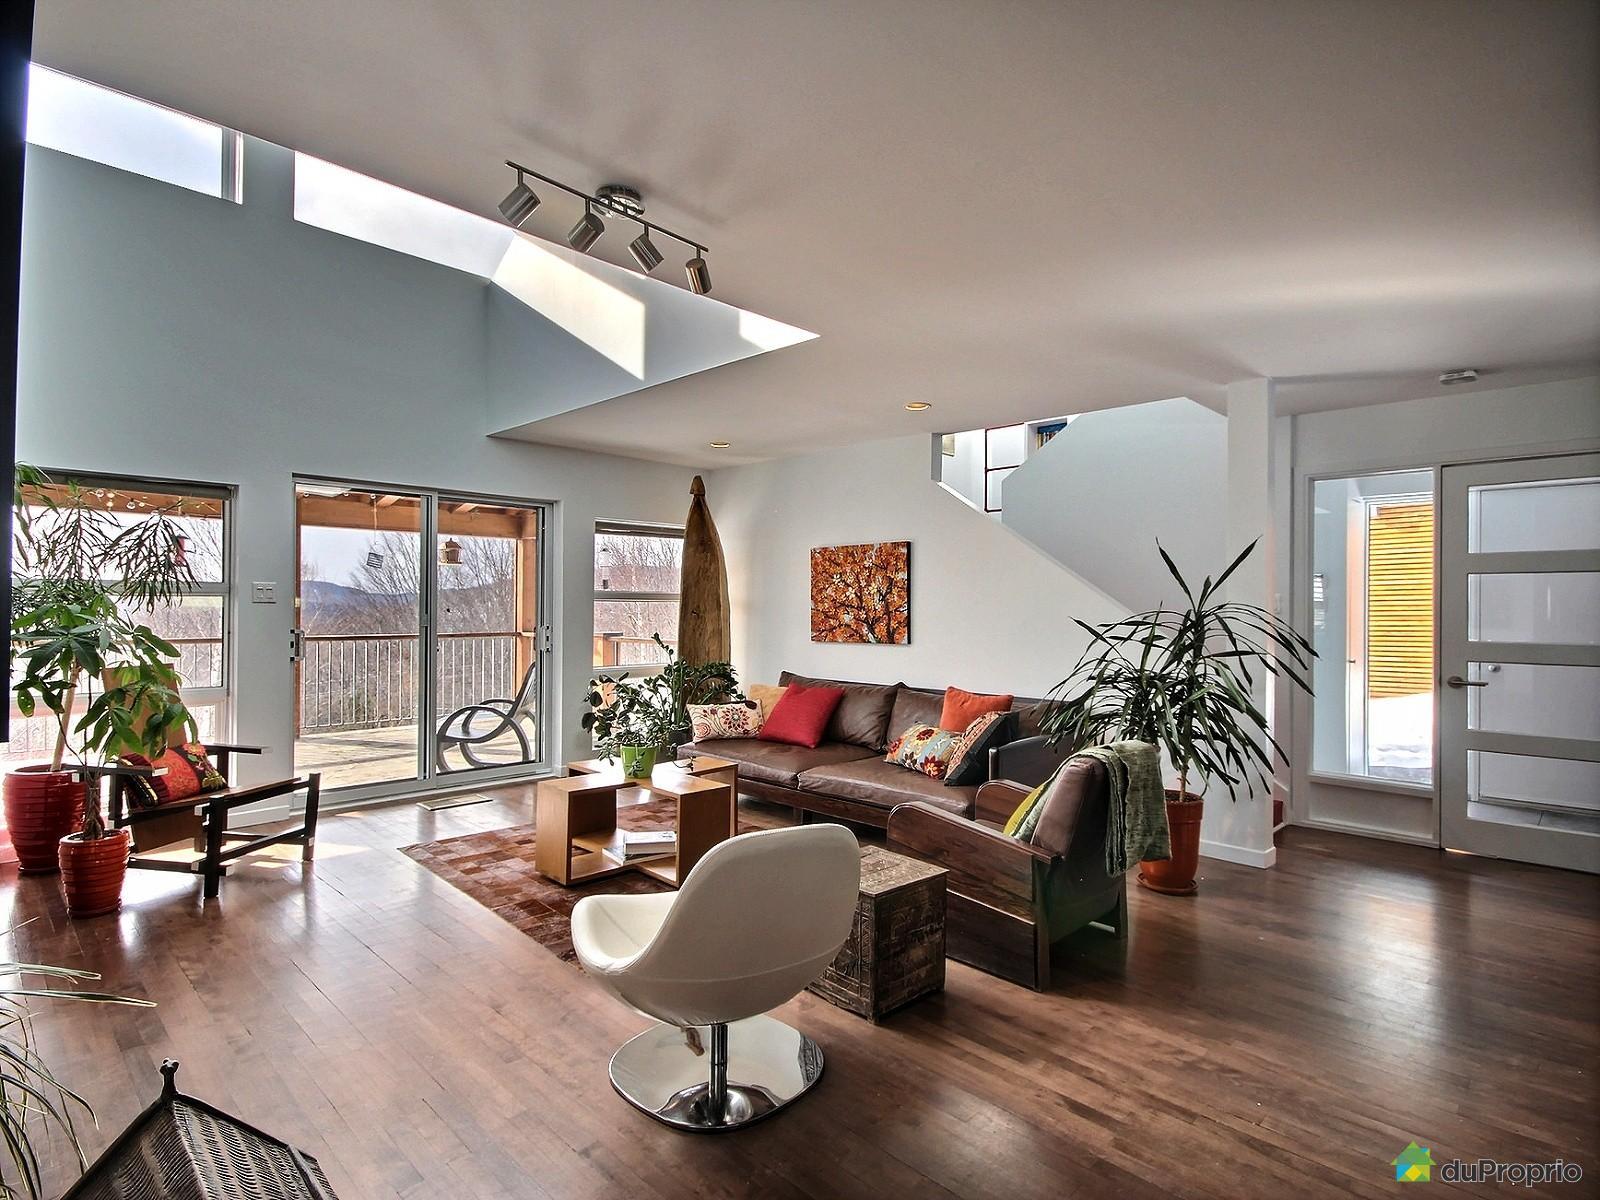 vente maison par adjudication